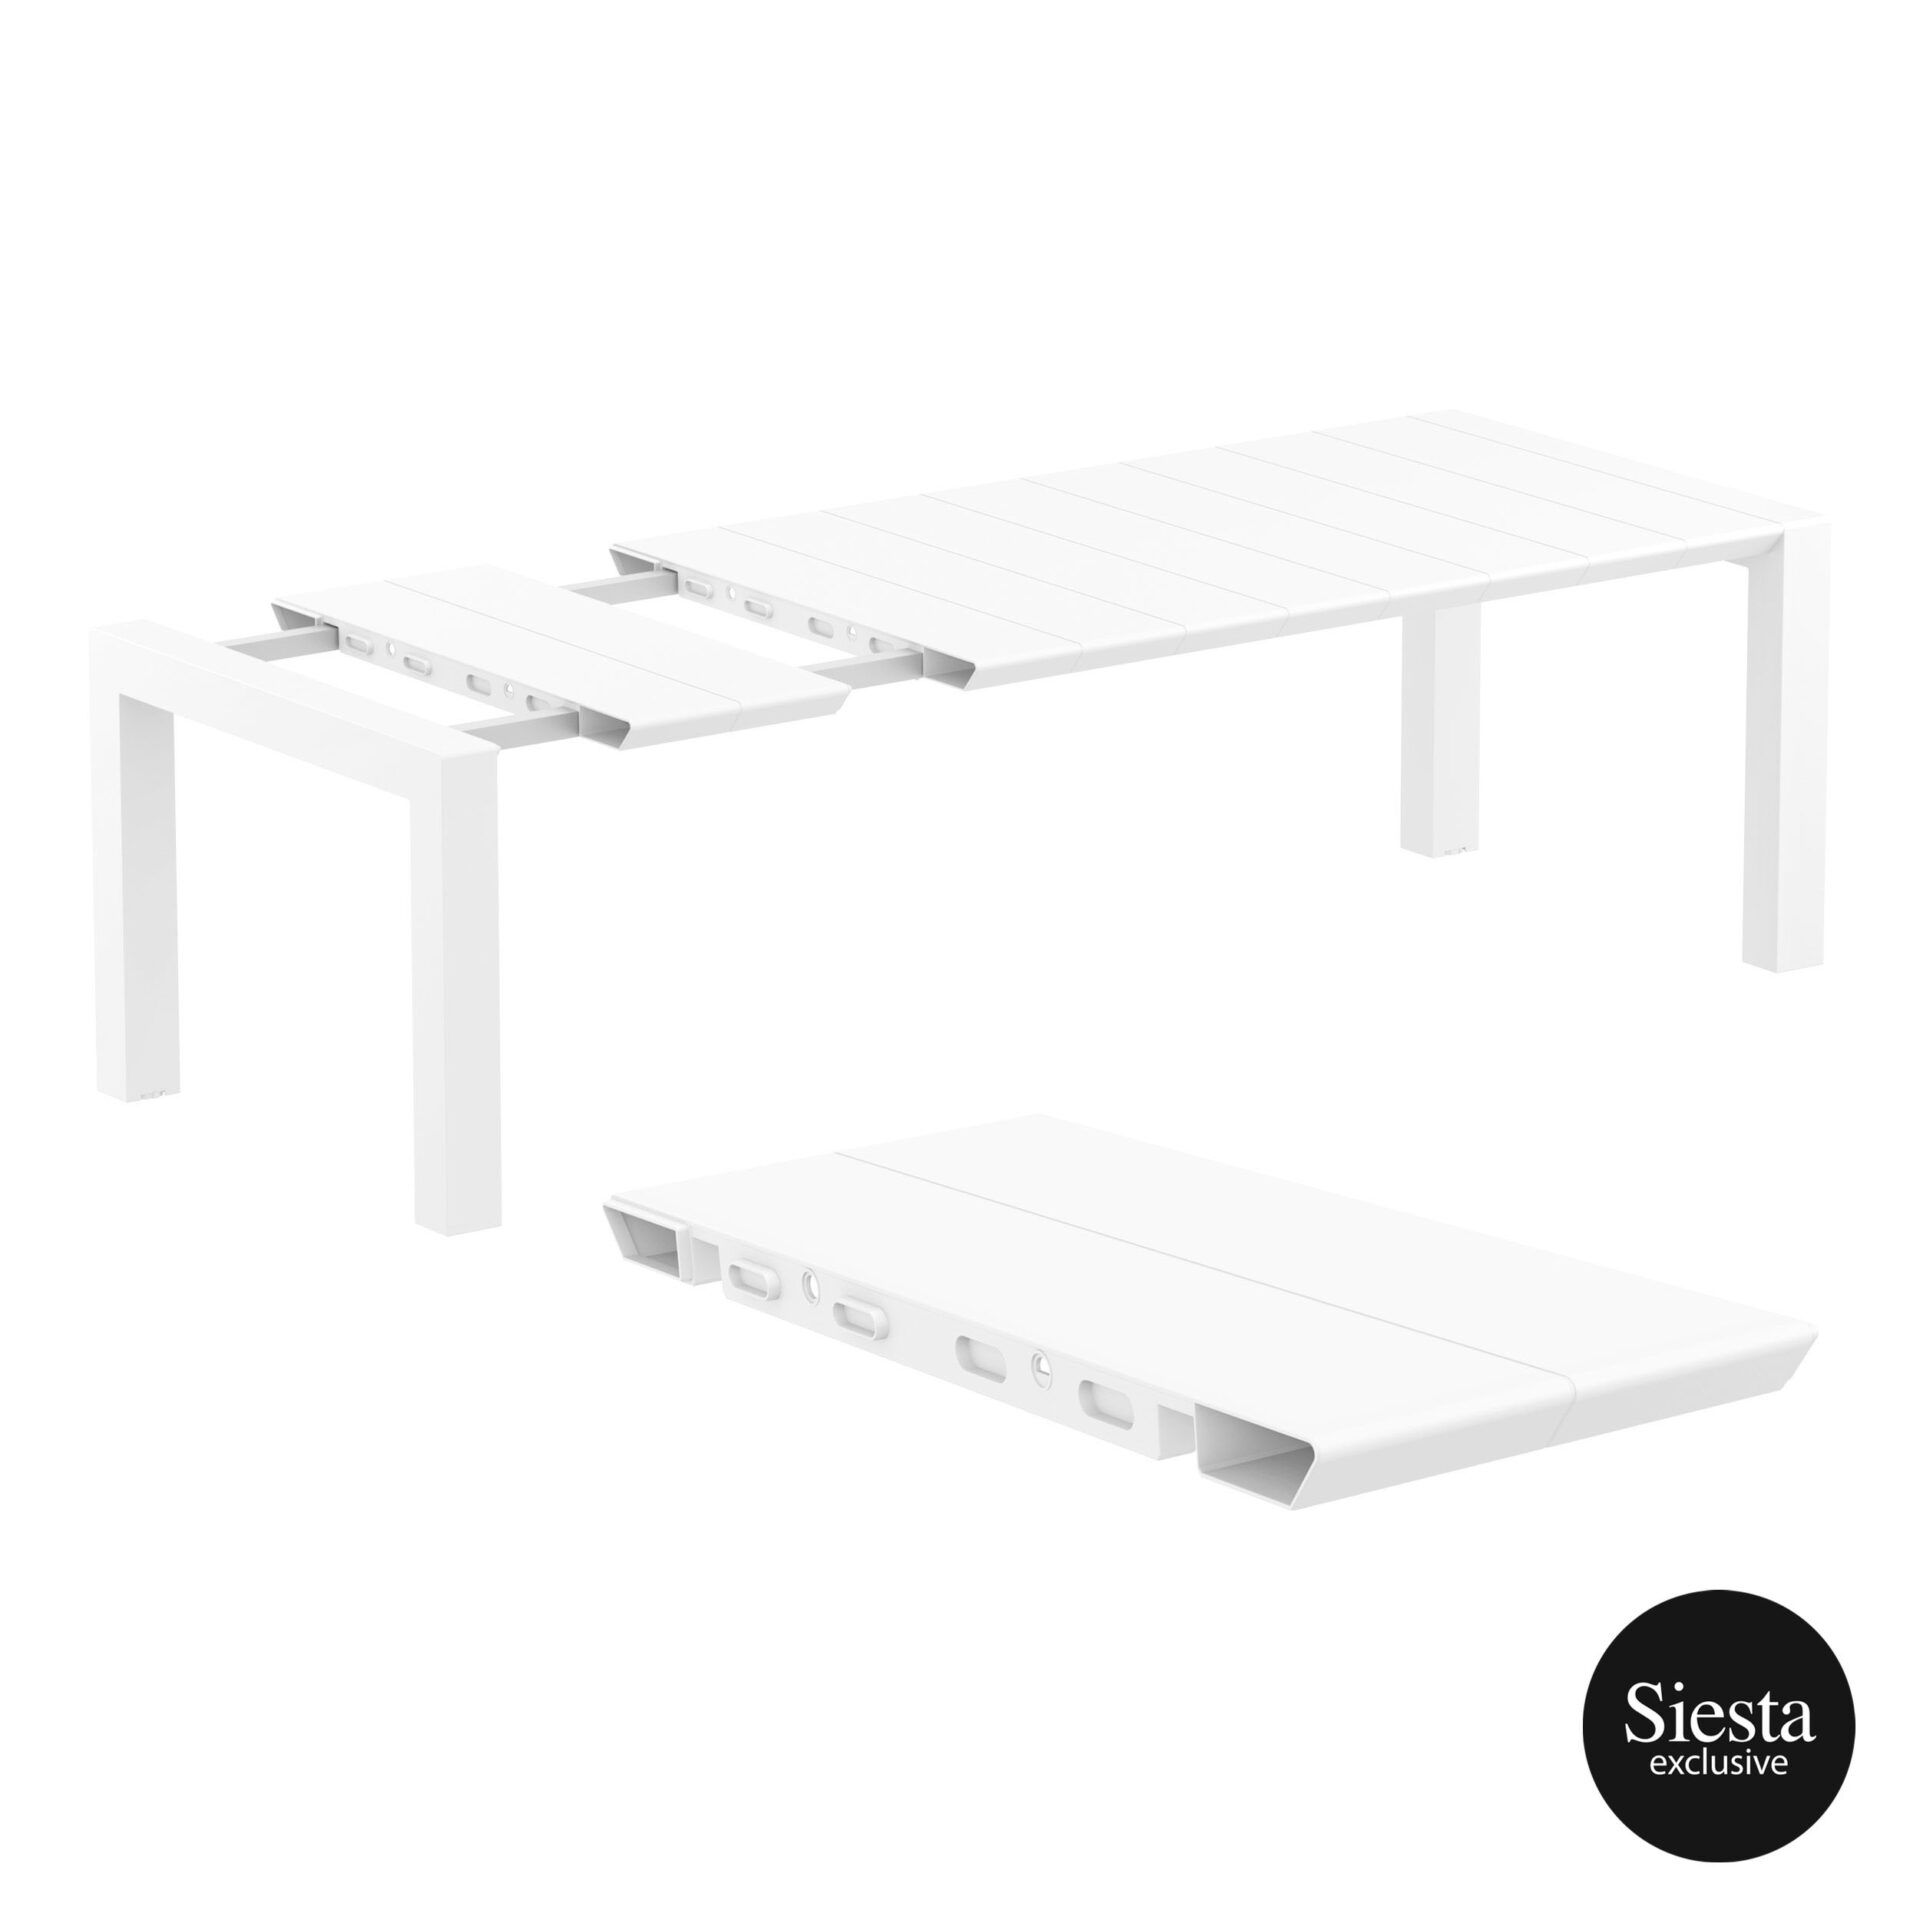 013 vegas table medium 220 white extension part